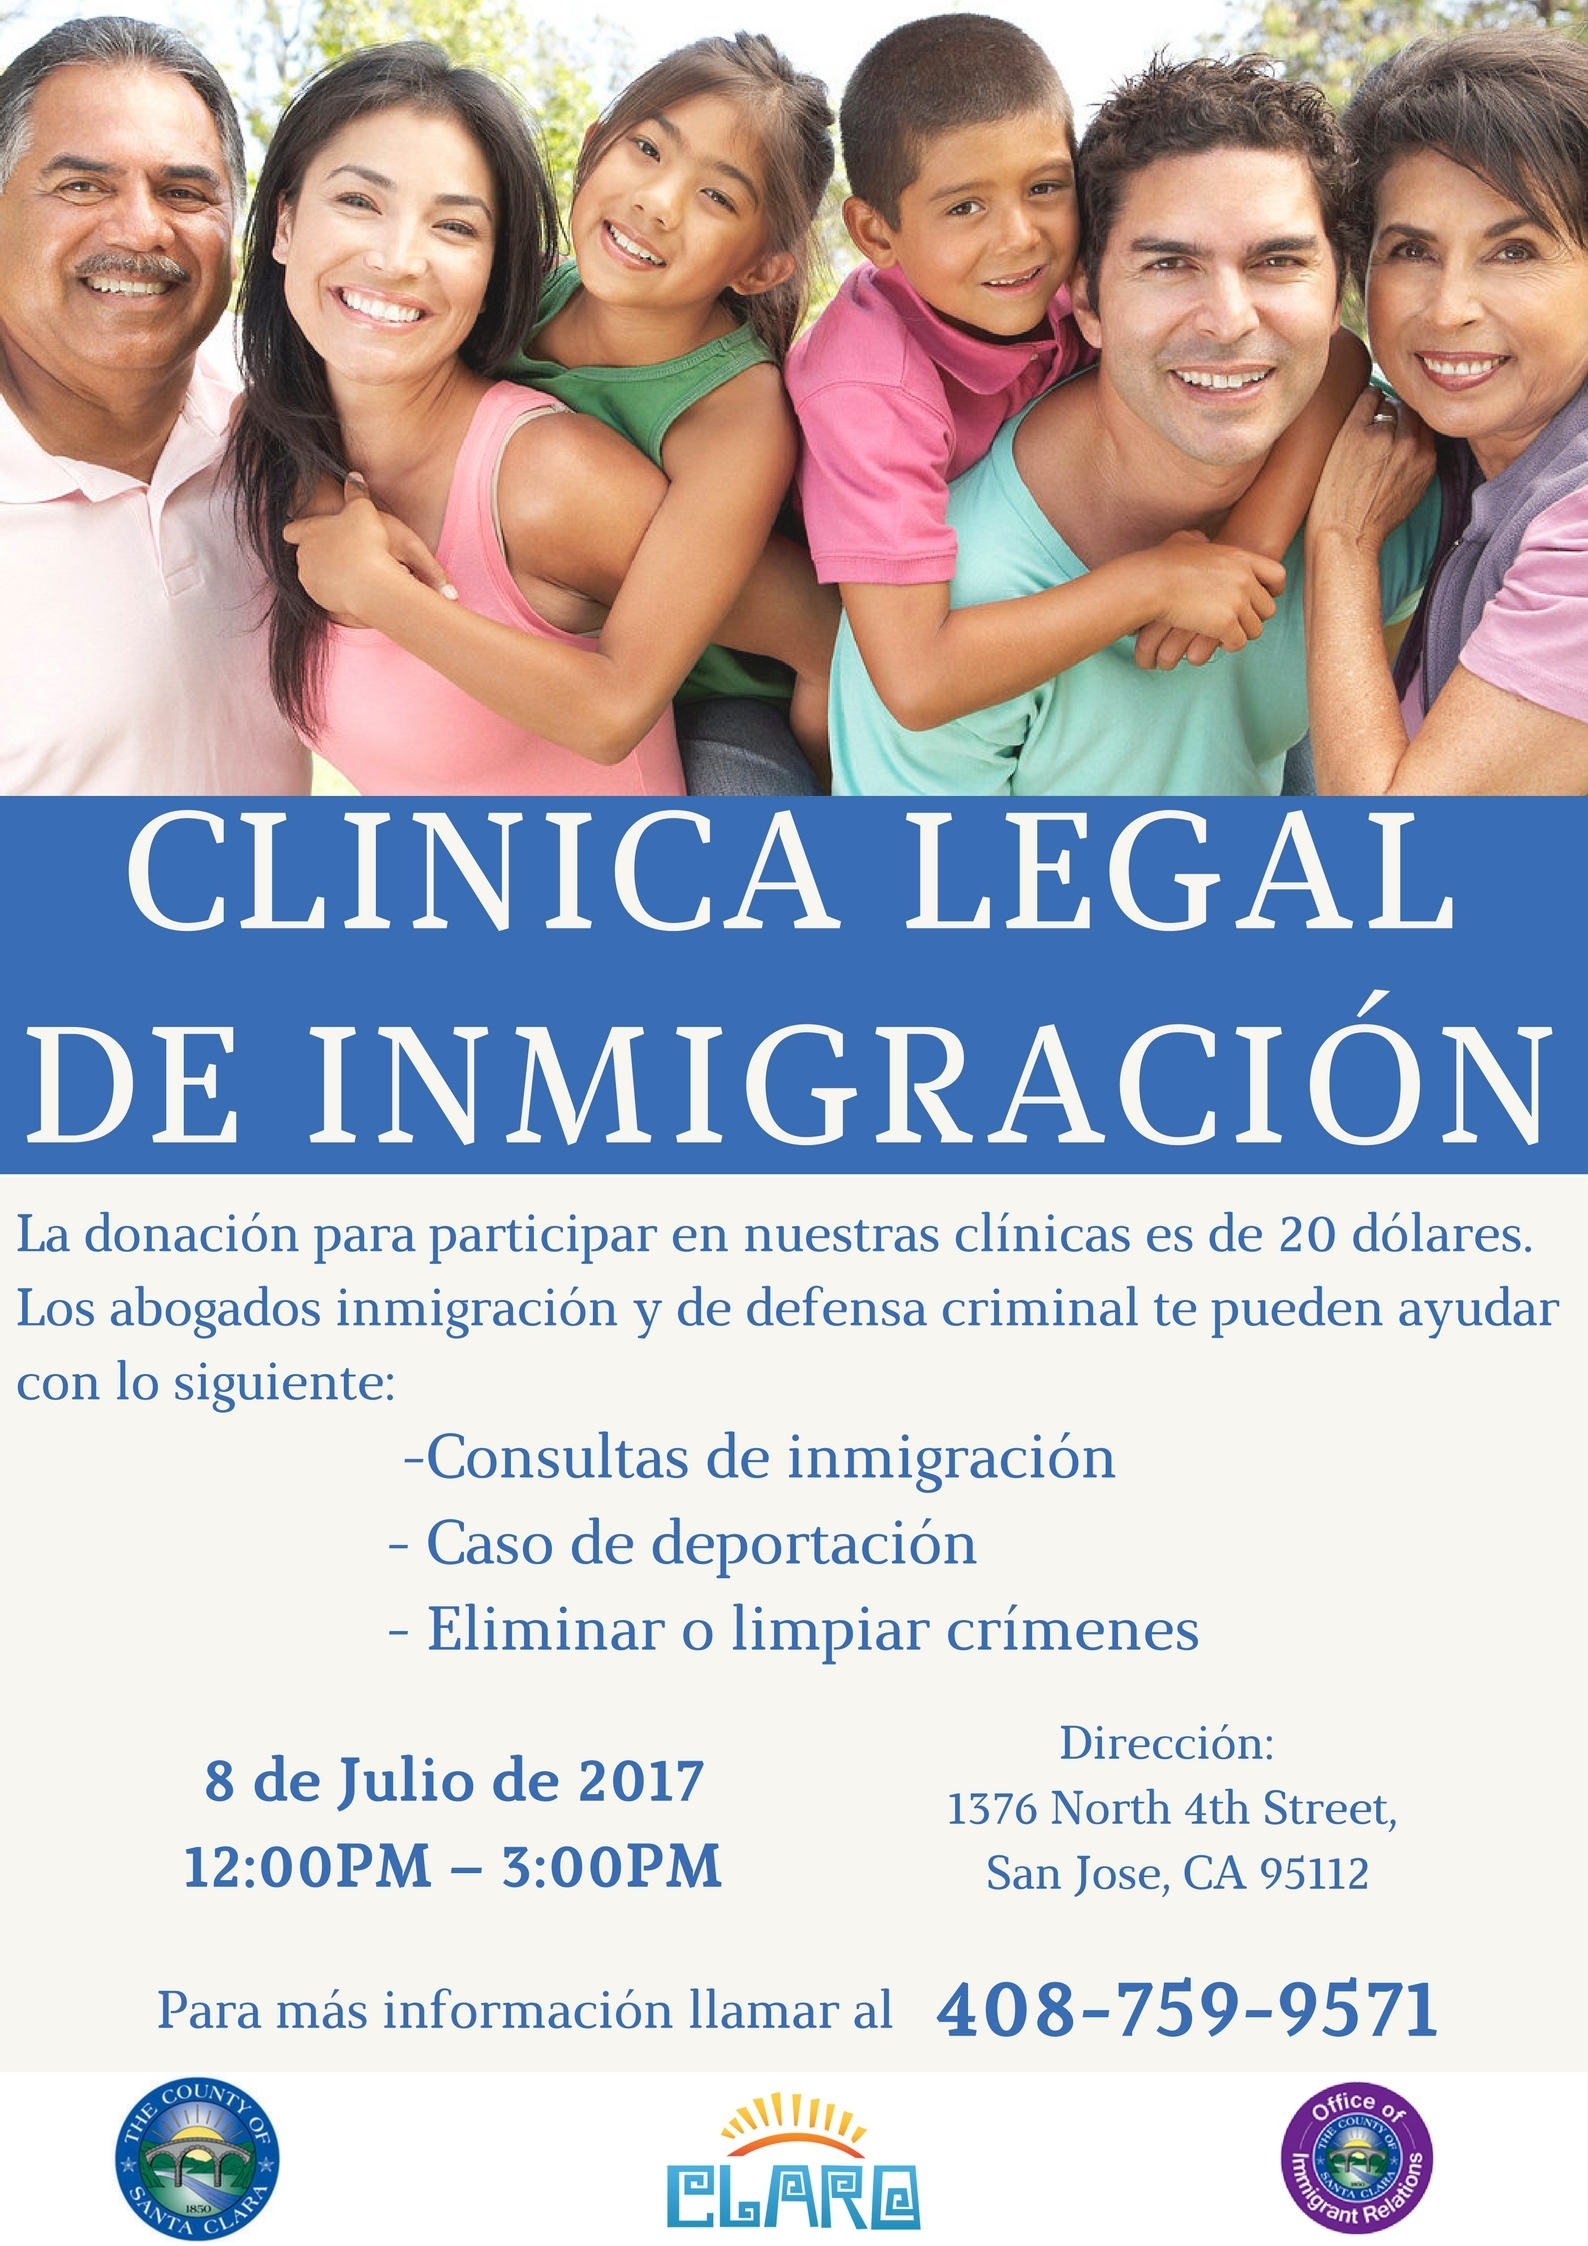 CLARO Clinica Legal